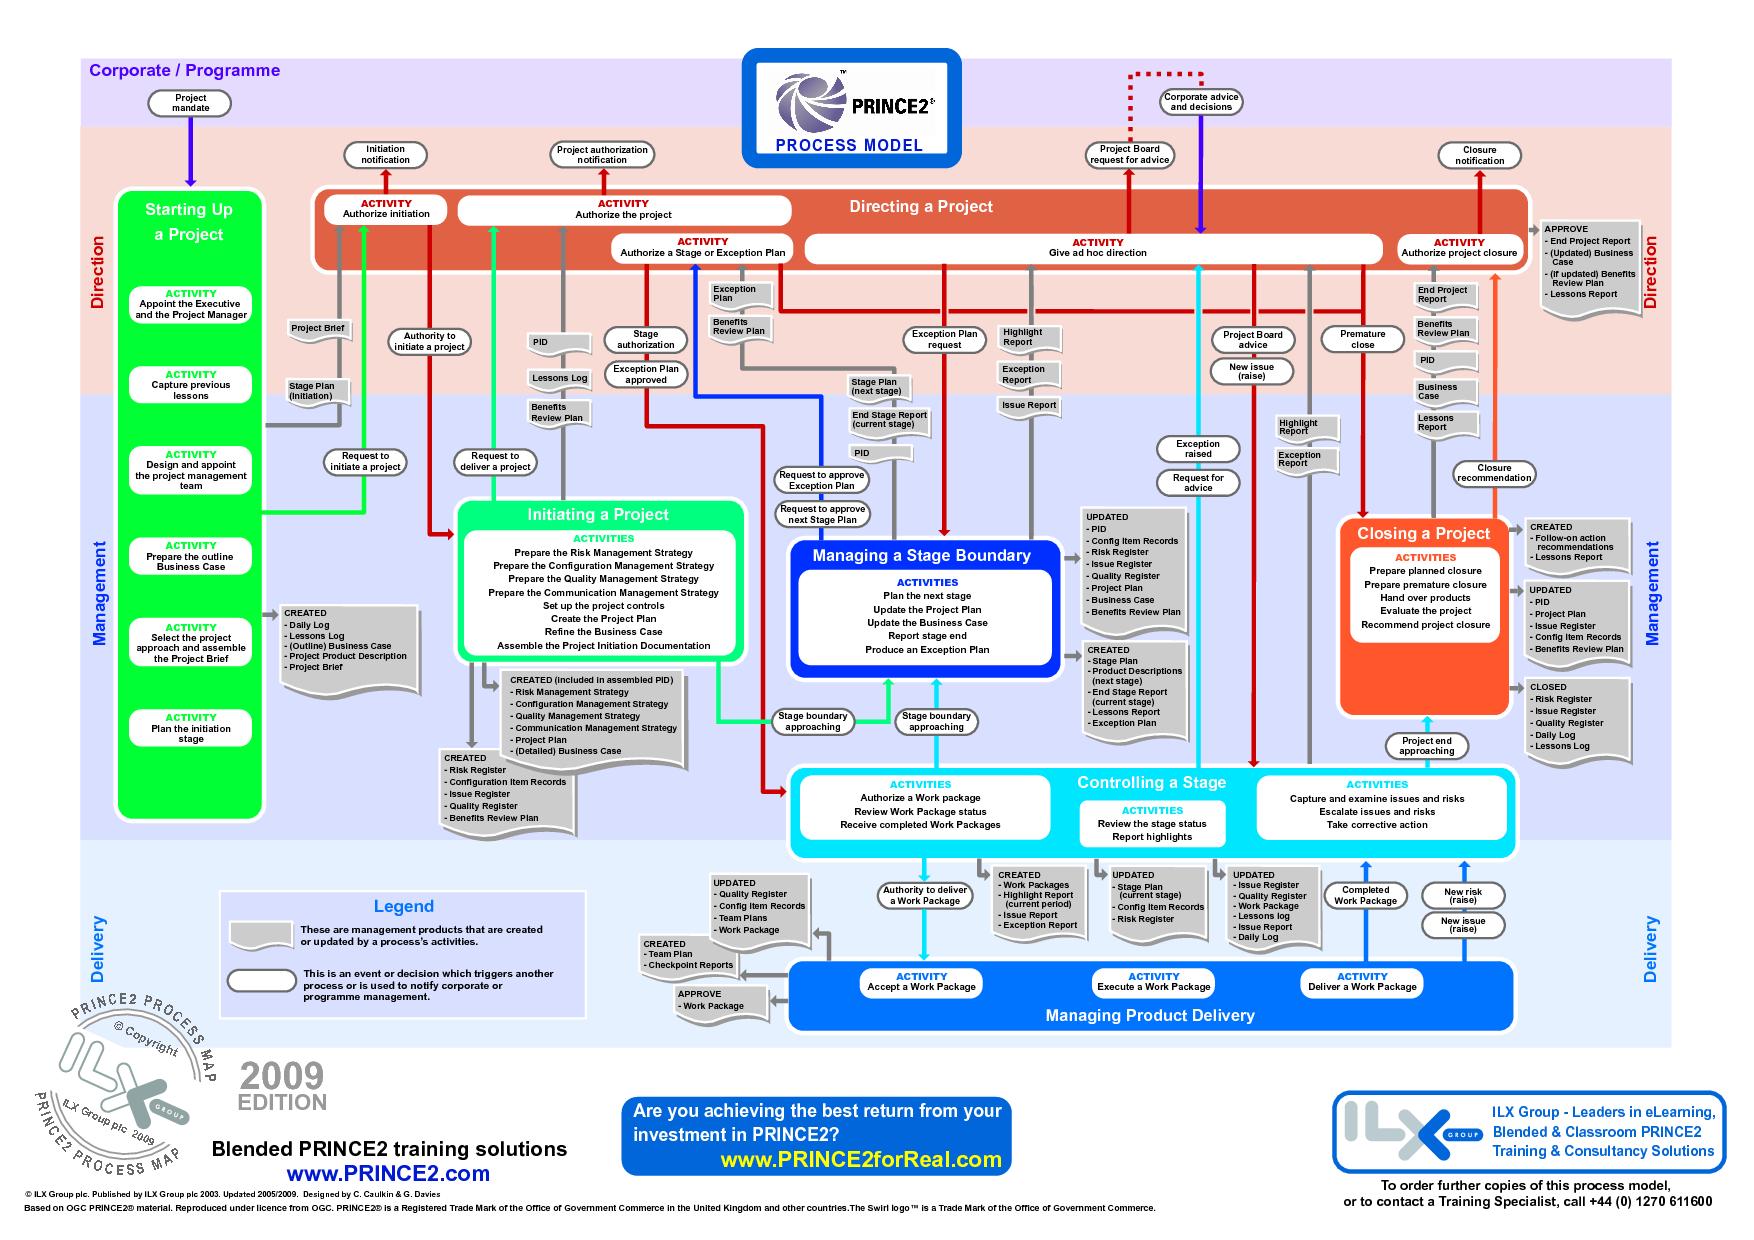 Prince2 Process Flow Diagram 2010 Detailed Schematics Powerpoint Google Search Project Management Pinterest Healthcare